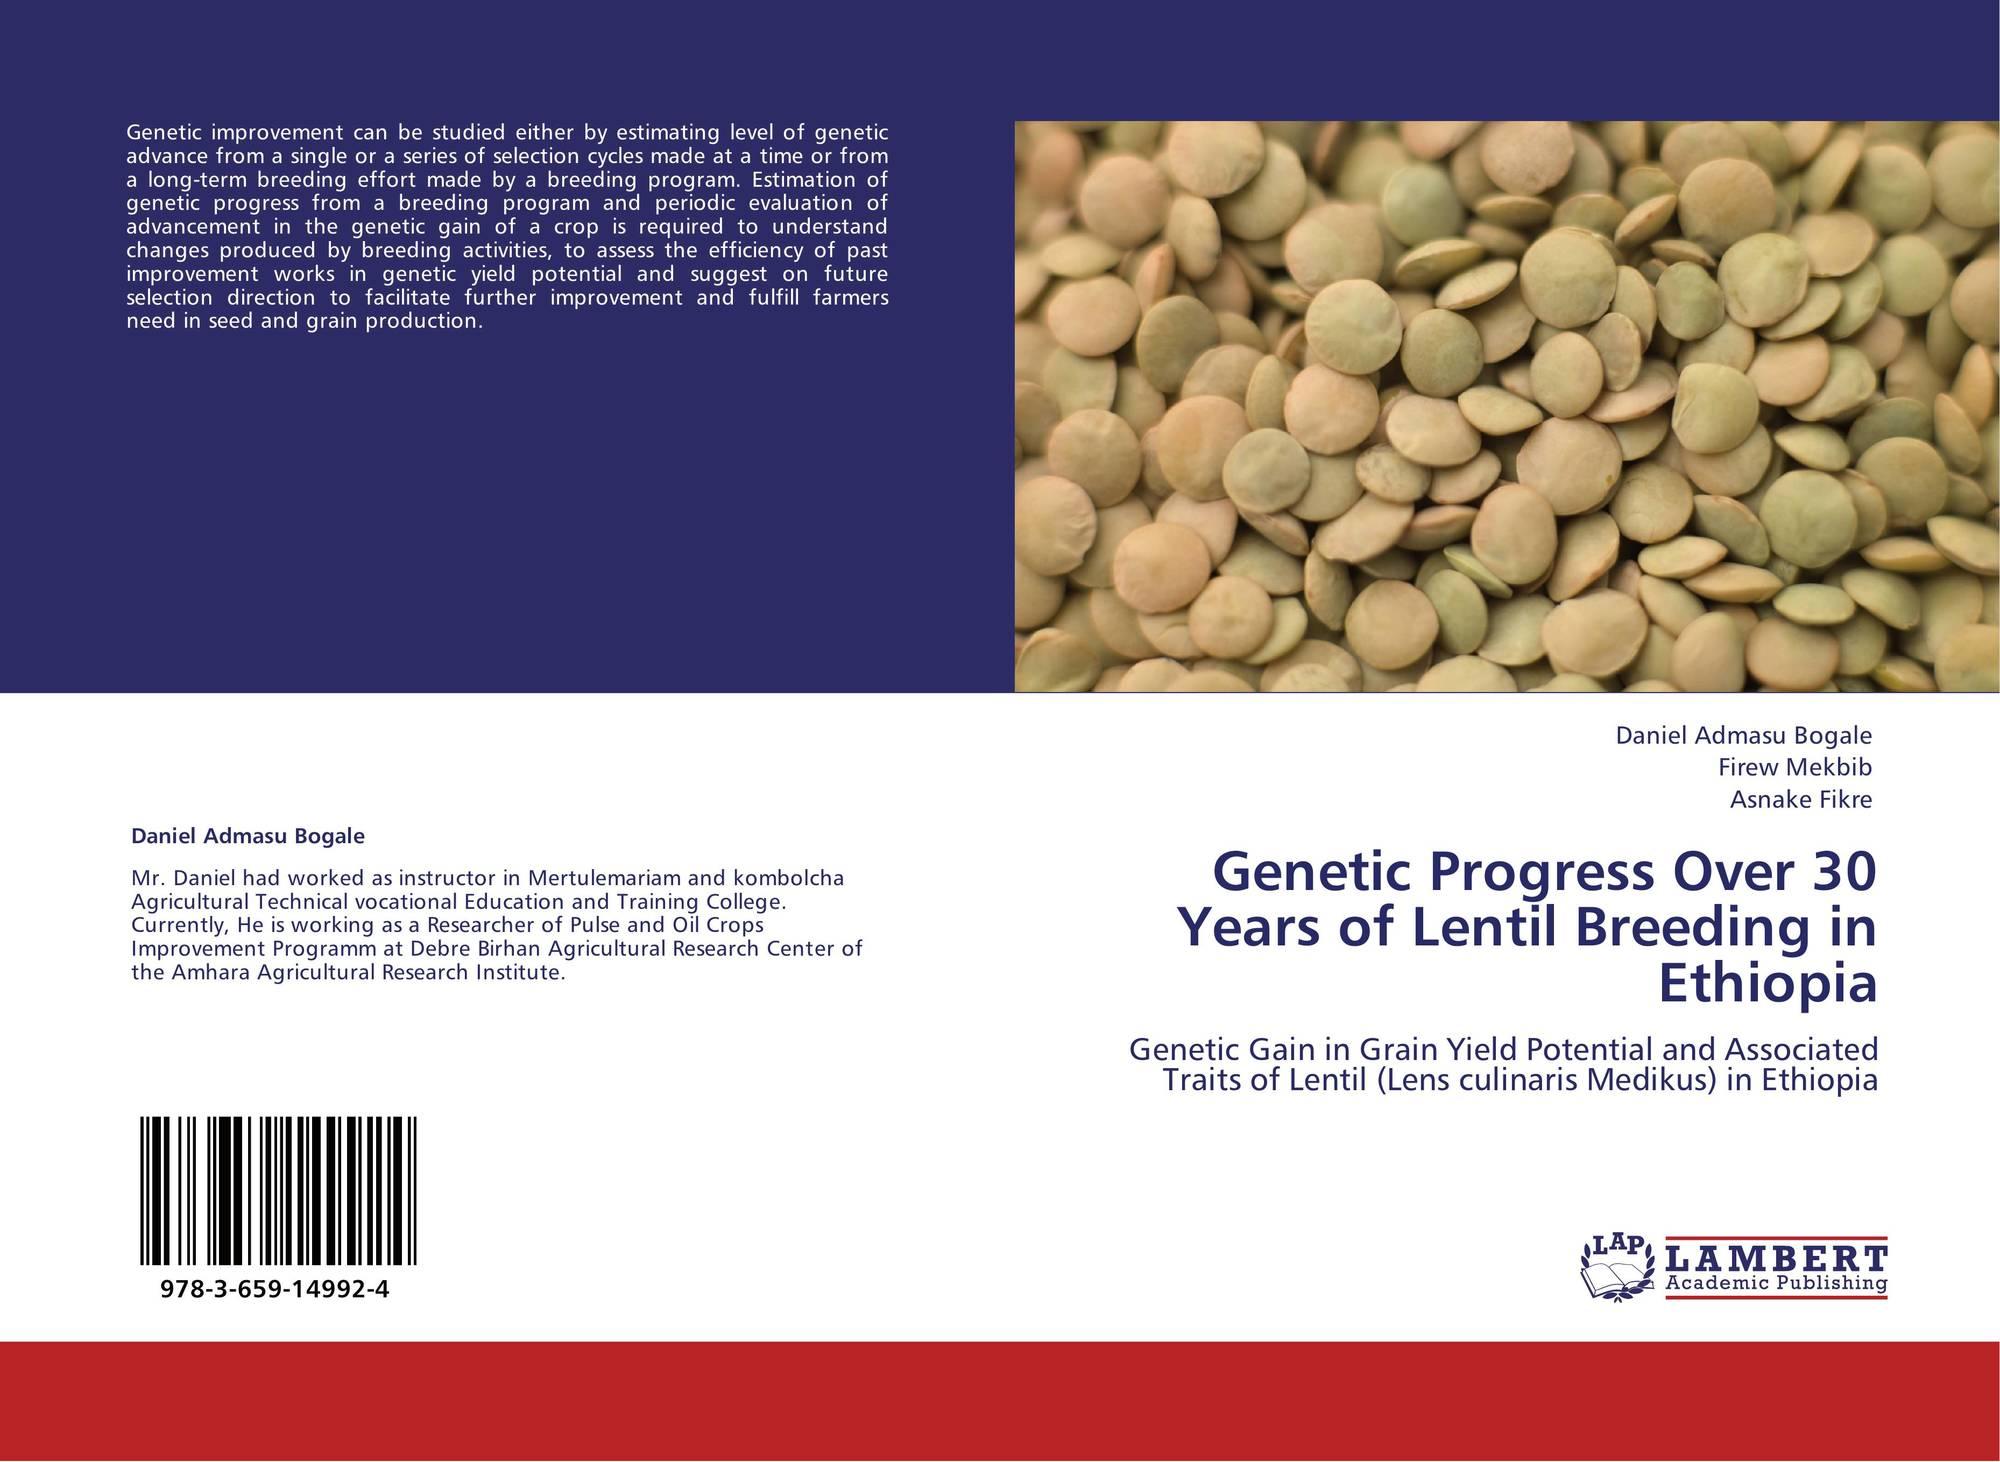 Genetic Progress Over 30 Years of Lentil Breeding in Ethiopia, 978-3